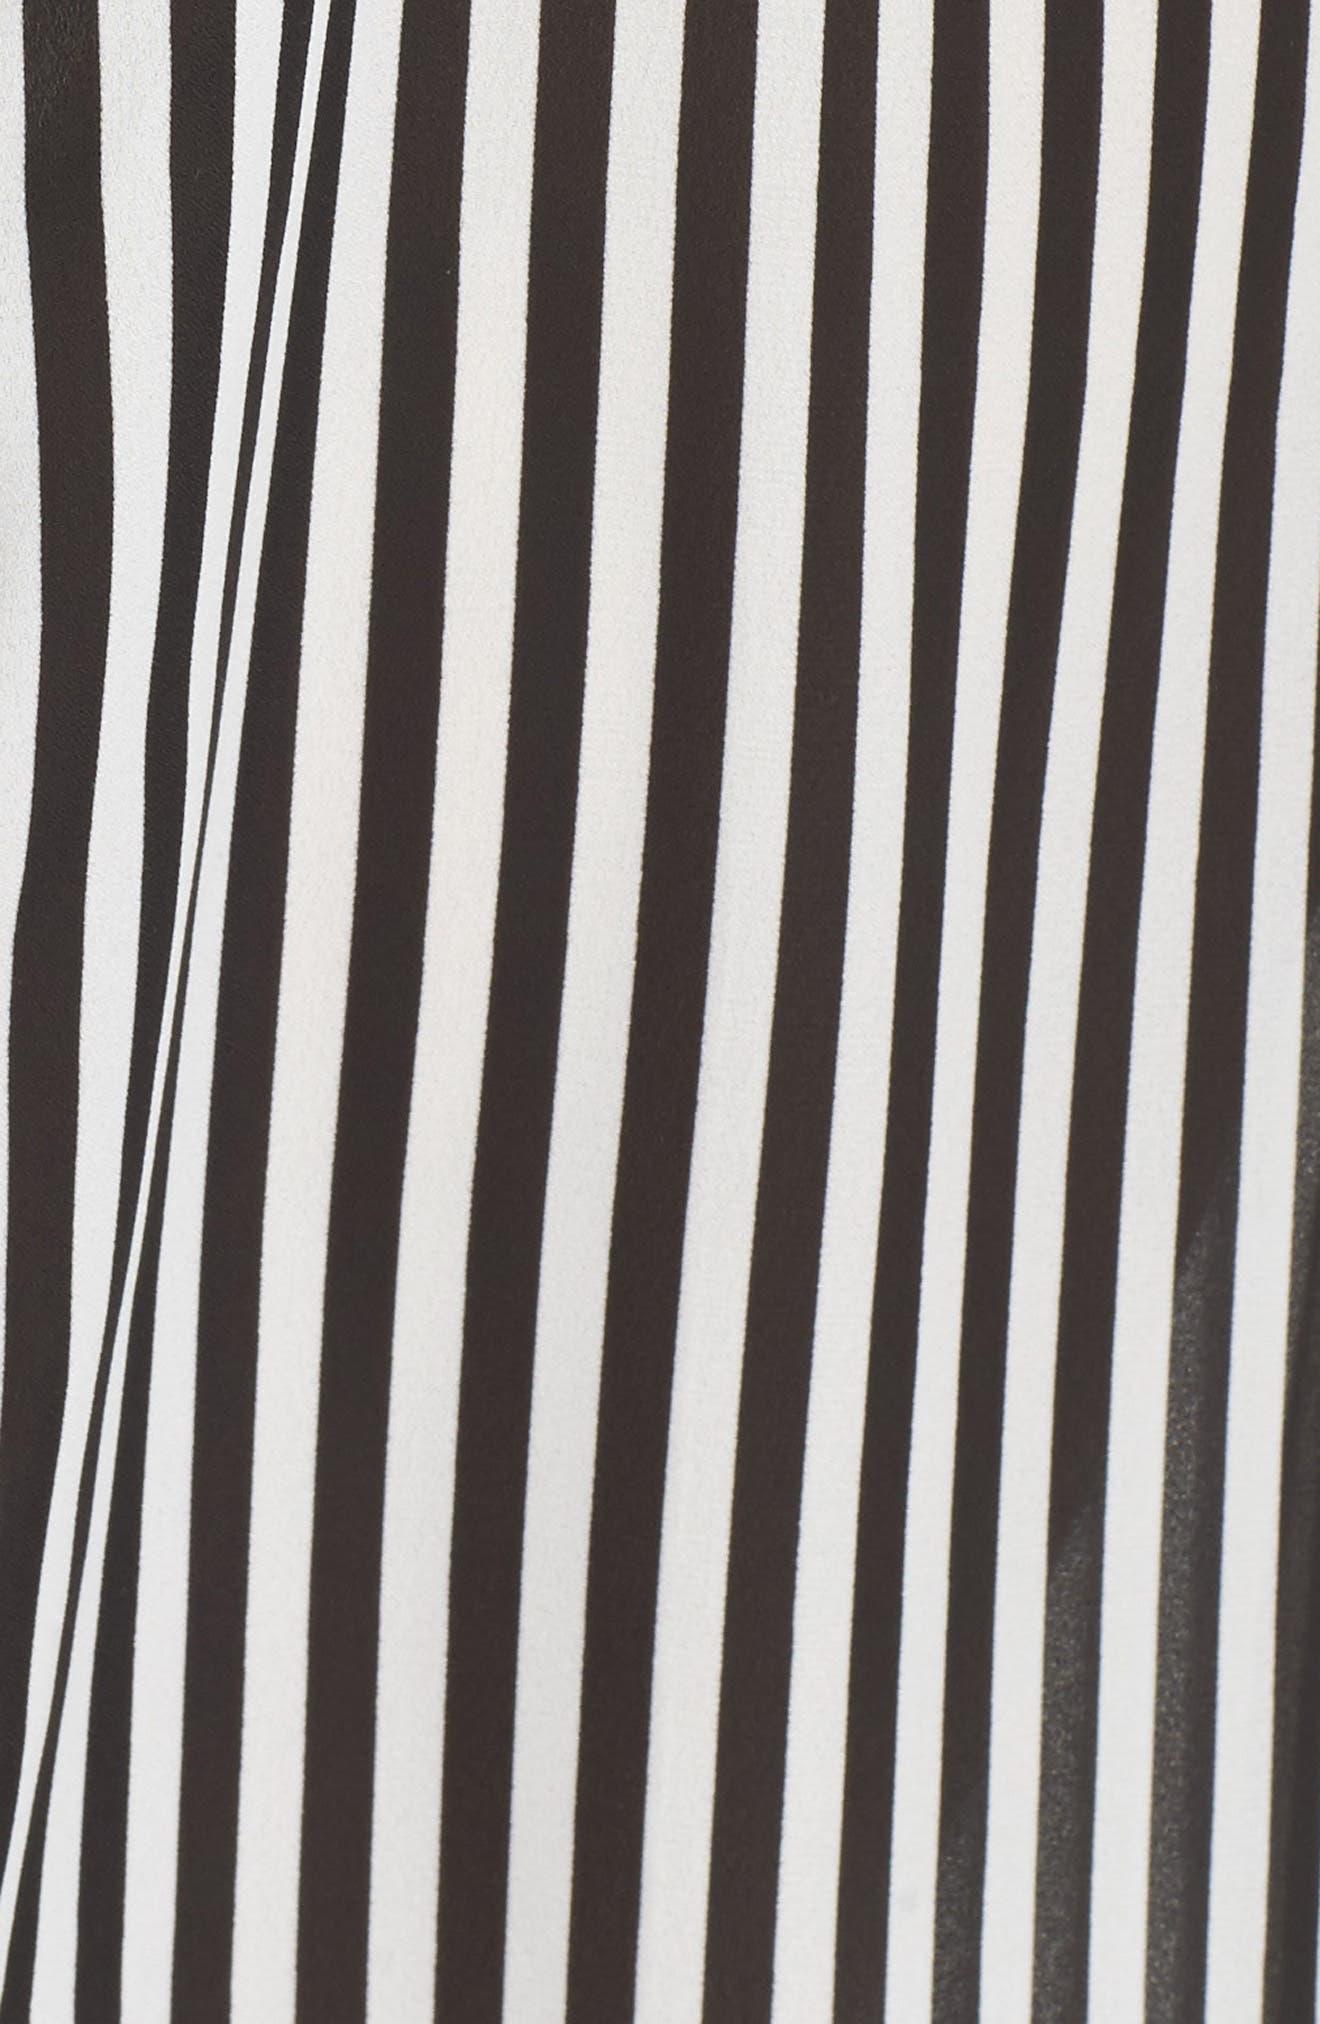 Belted Stripe Shirtdress,                             Alternate thumbnail 5, color,                             161